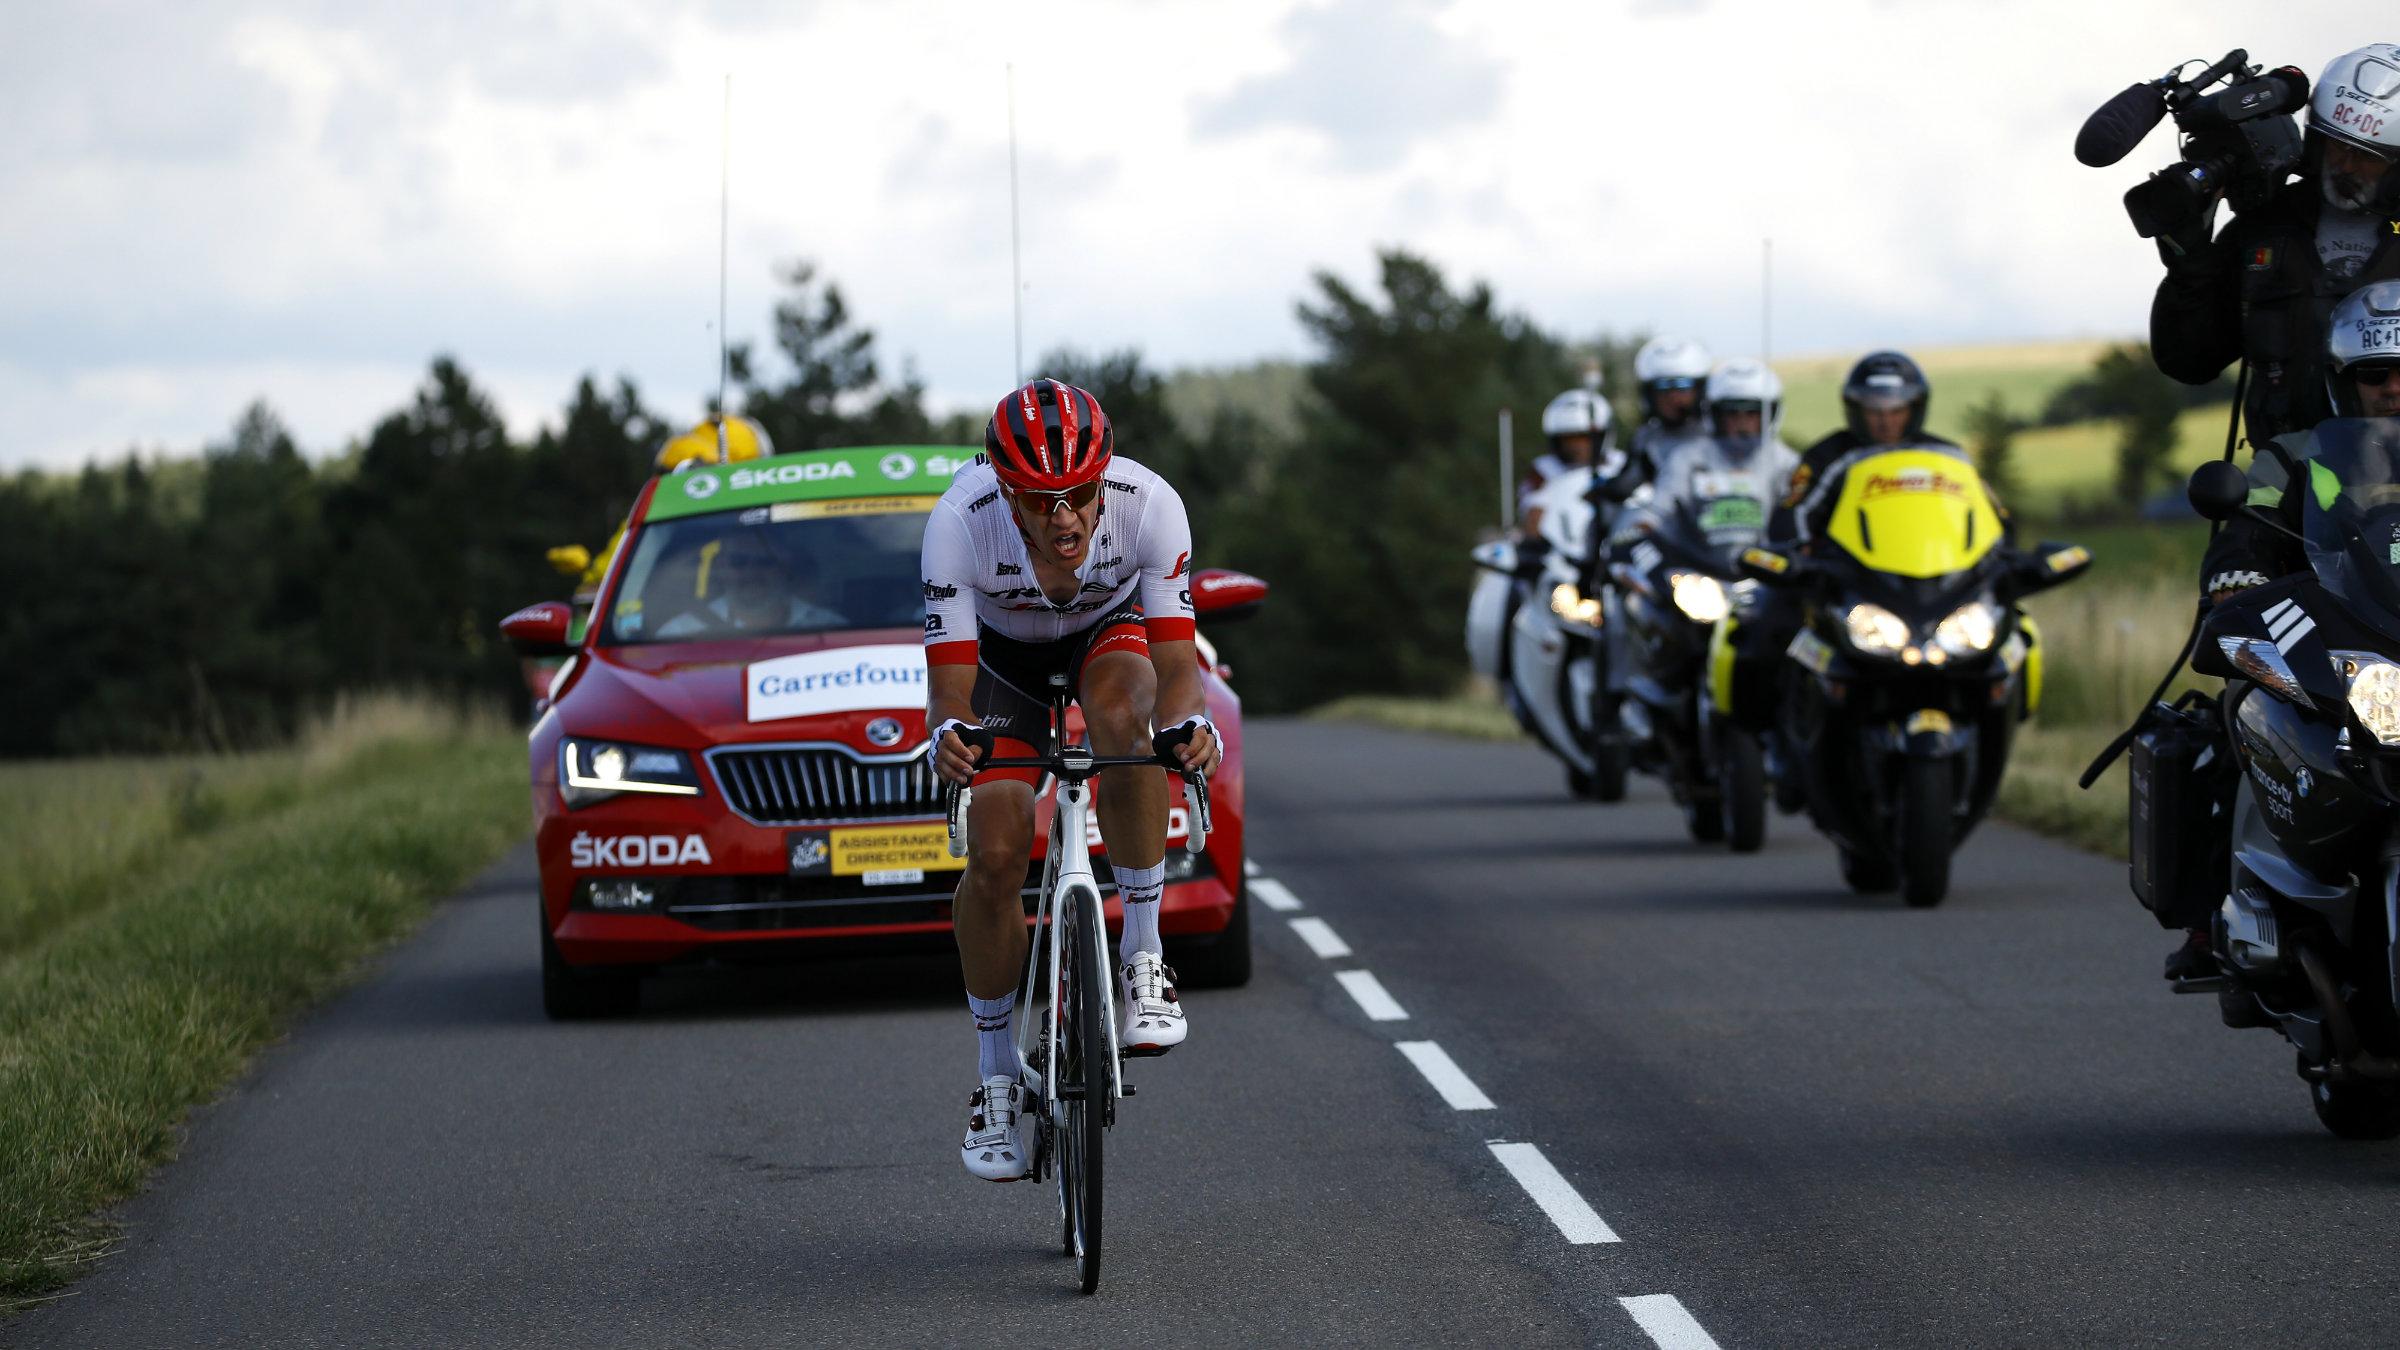 Cyclist in the Tour de France followed by cameramen